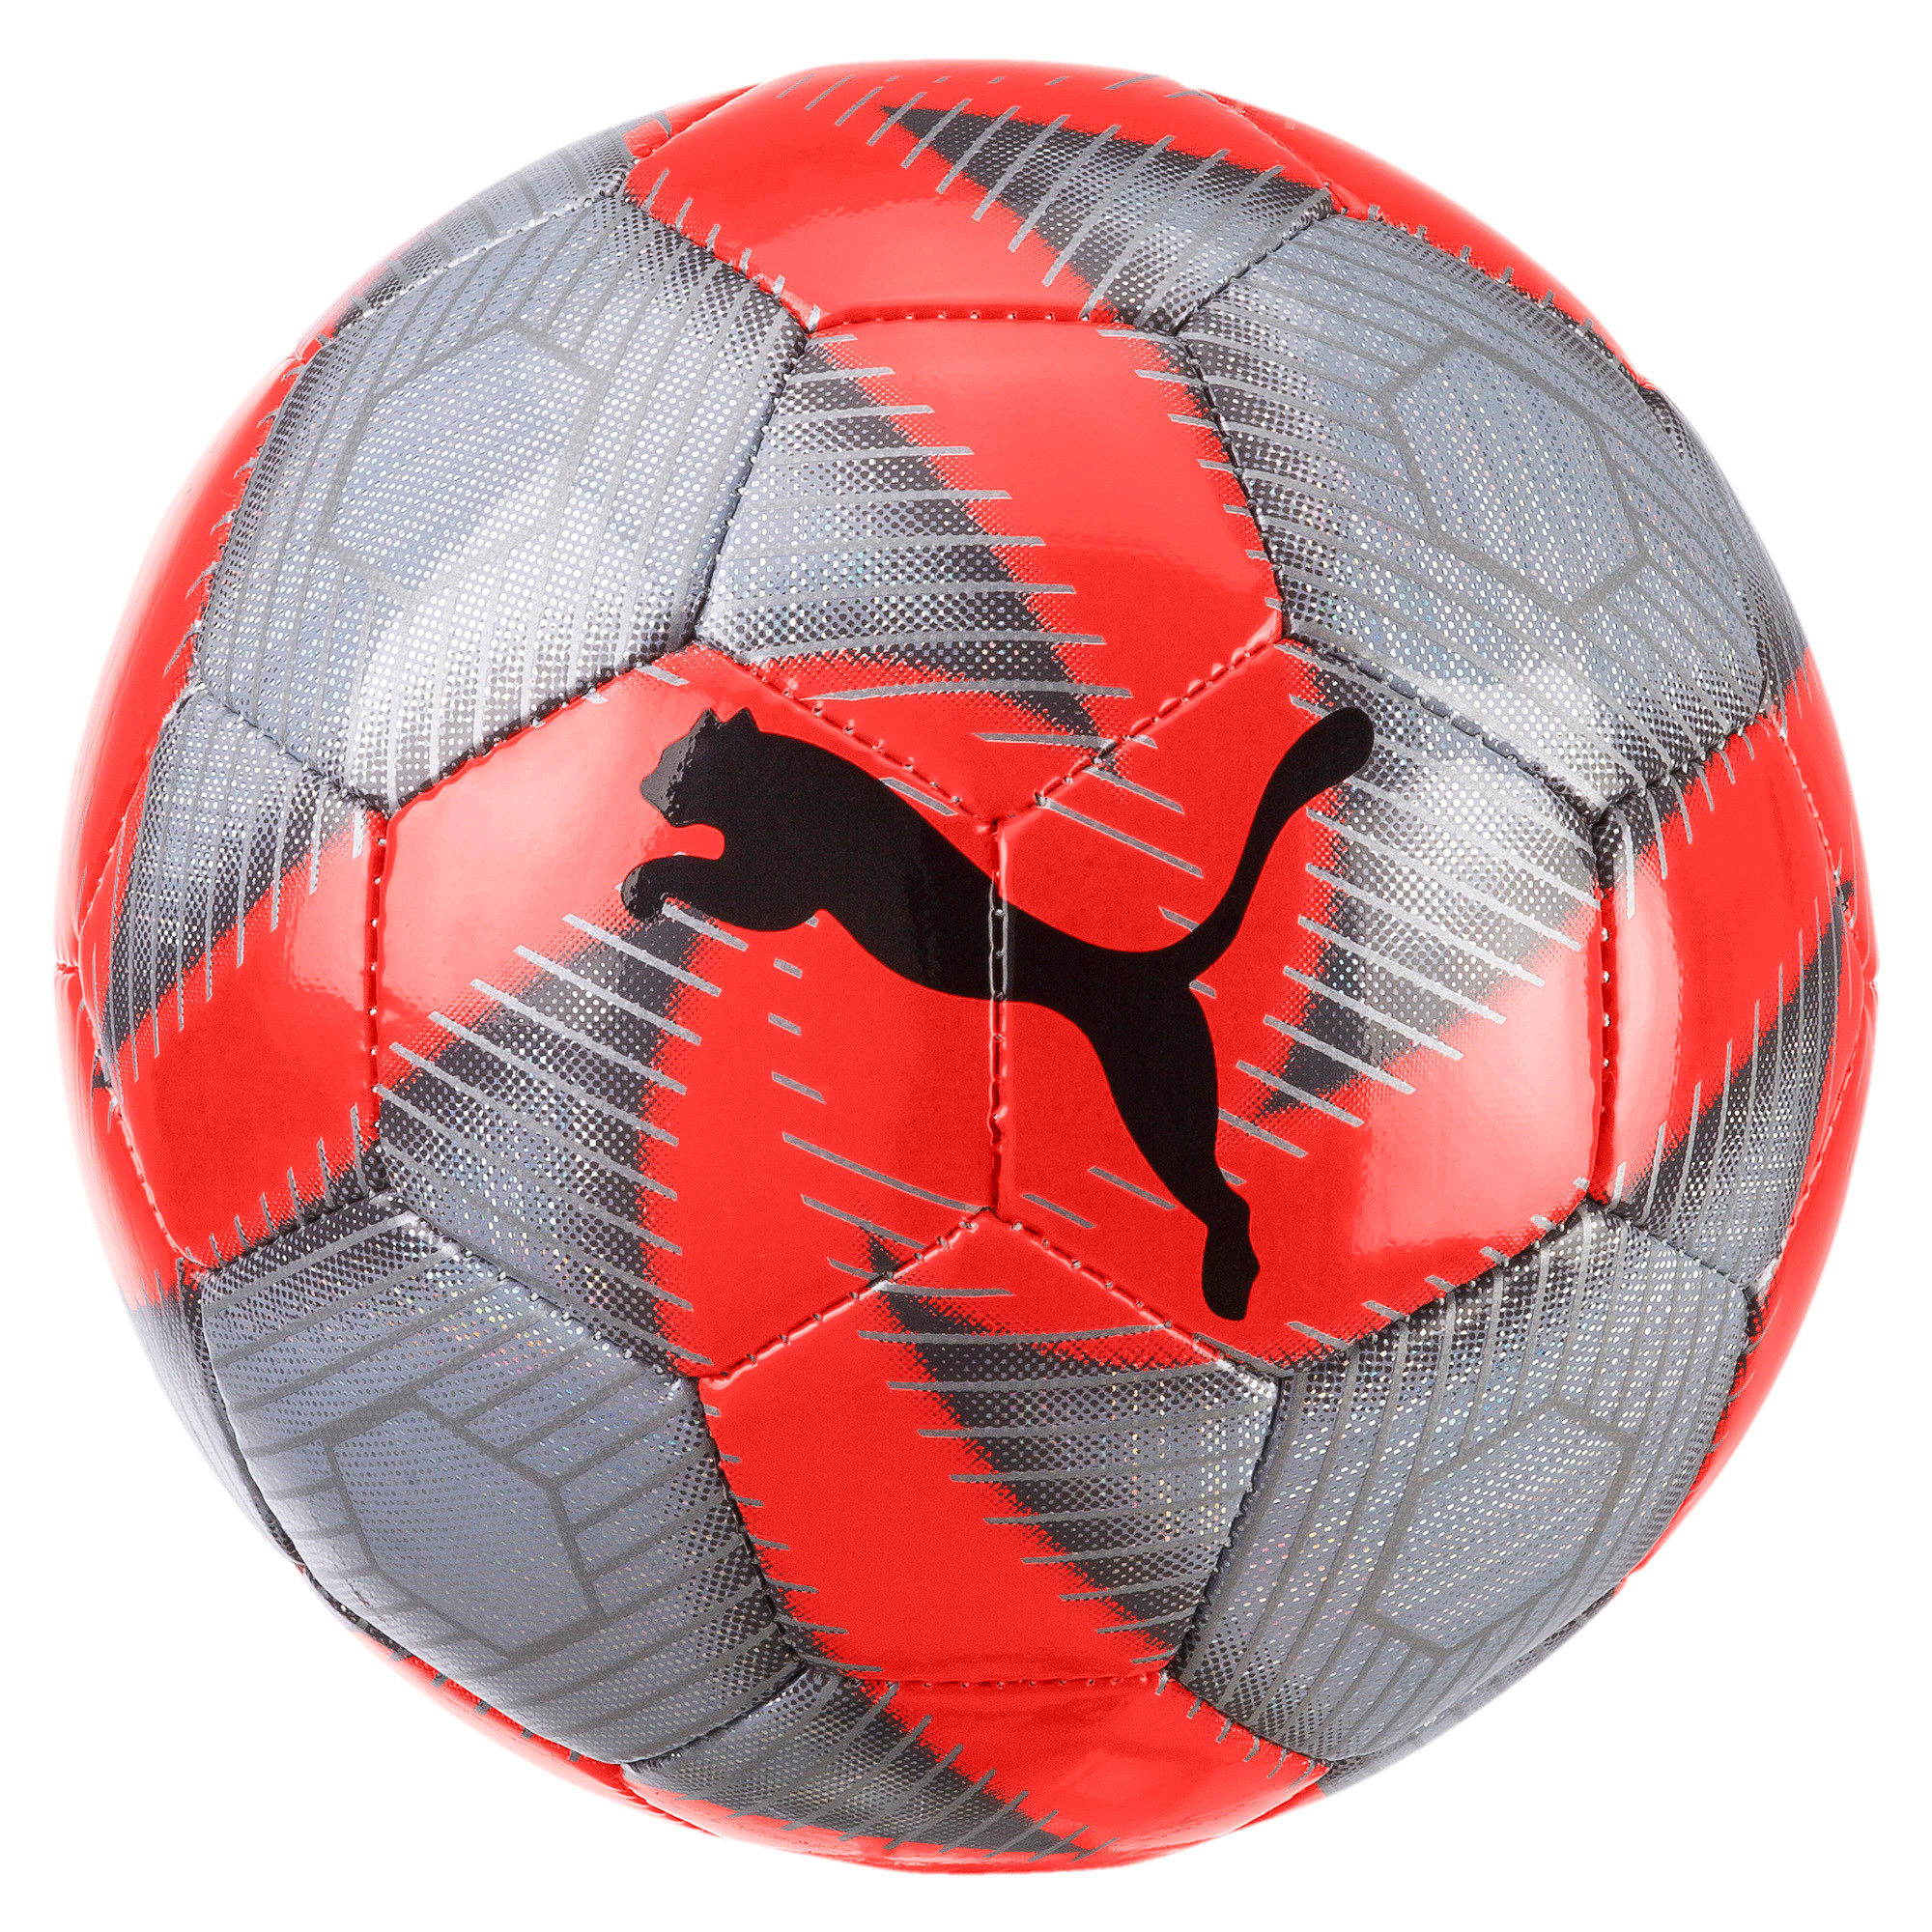 Thumbnail 1 of FUTURE Flare Mini Soccer Ball, Grey-Nrgy Red-CASTLE-White, medium